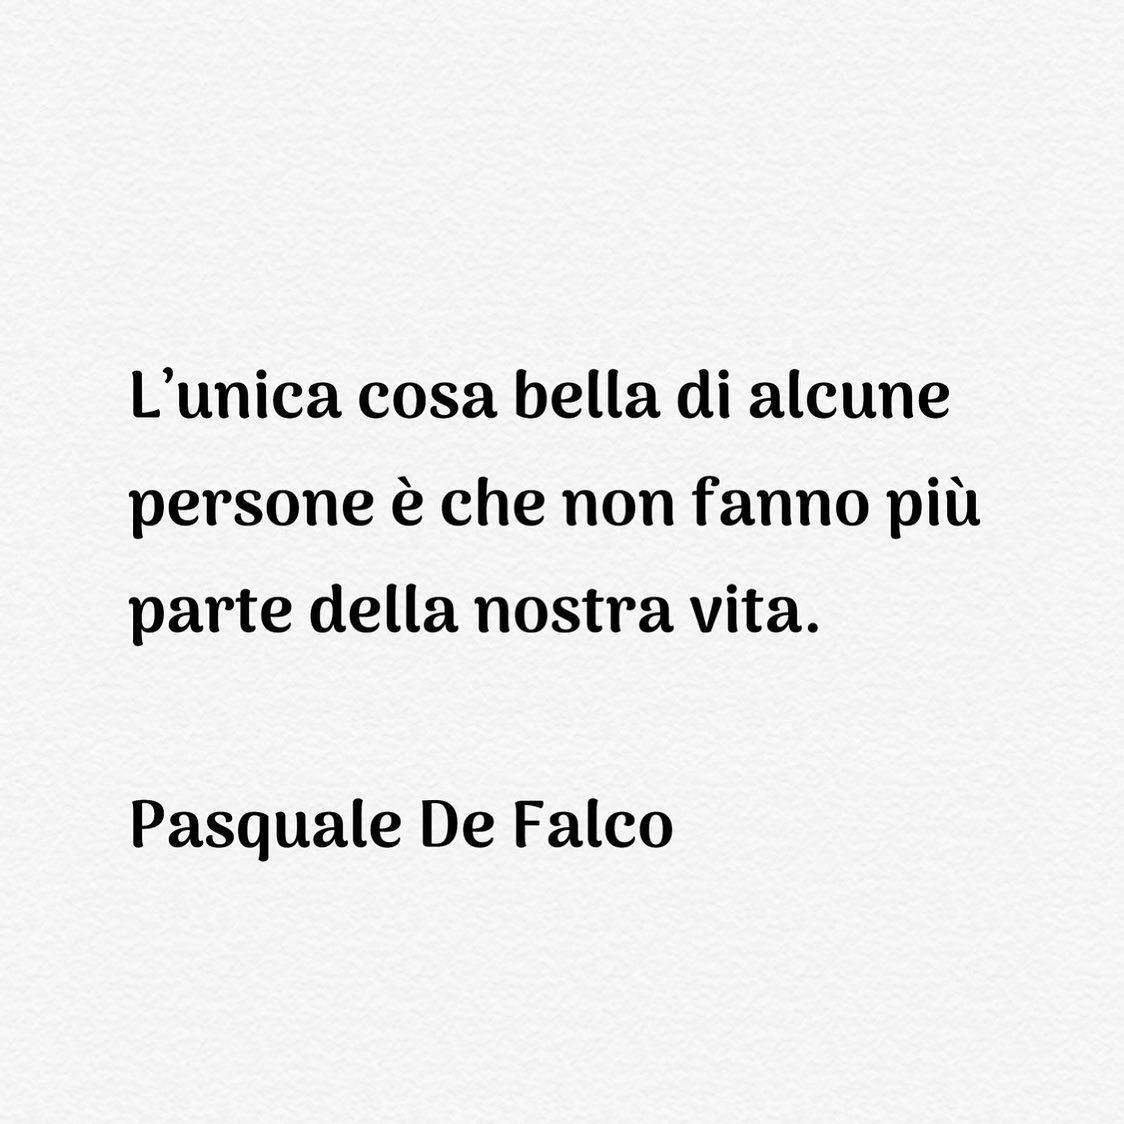 #frasi #frasiitaliane #citazioni